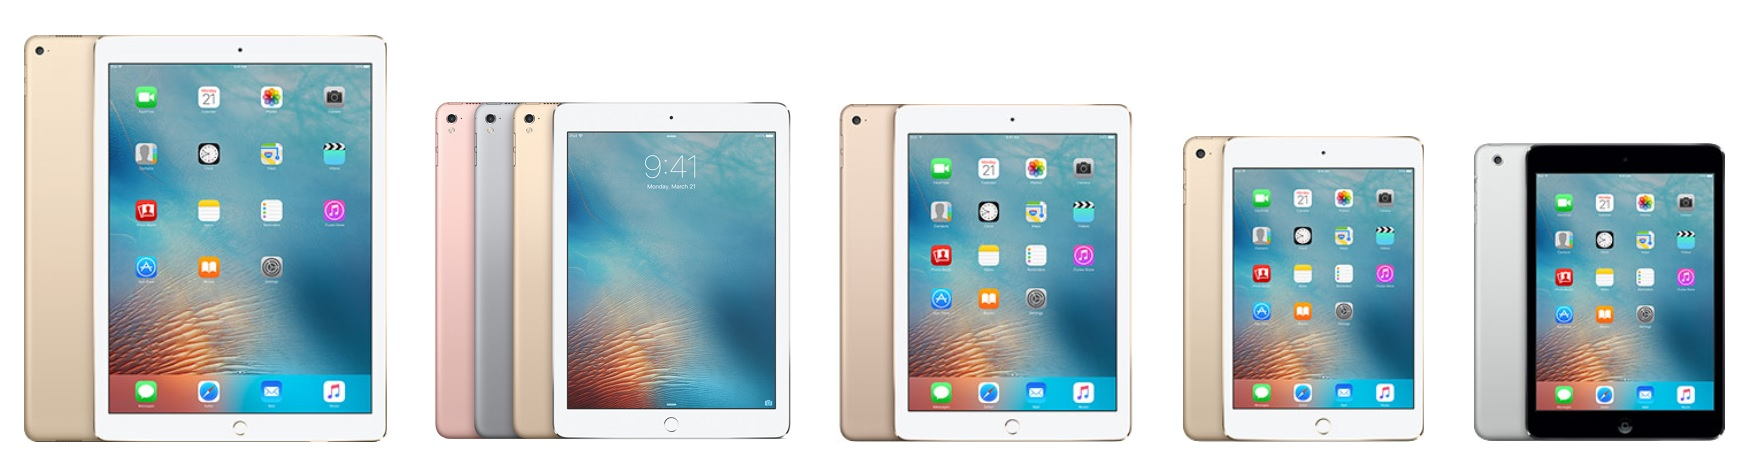 iPady 2016